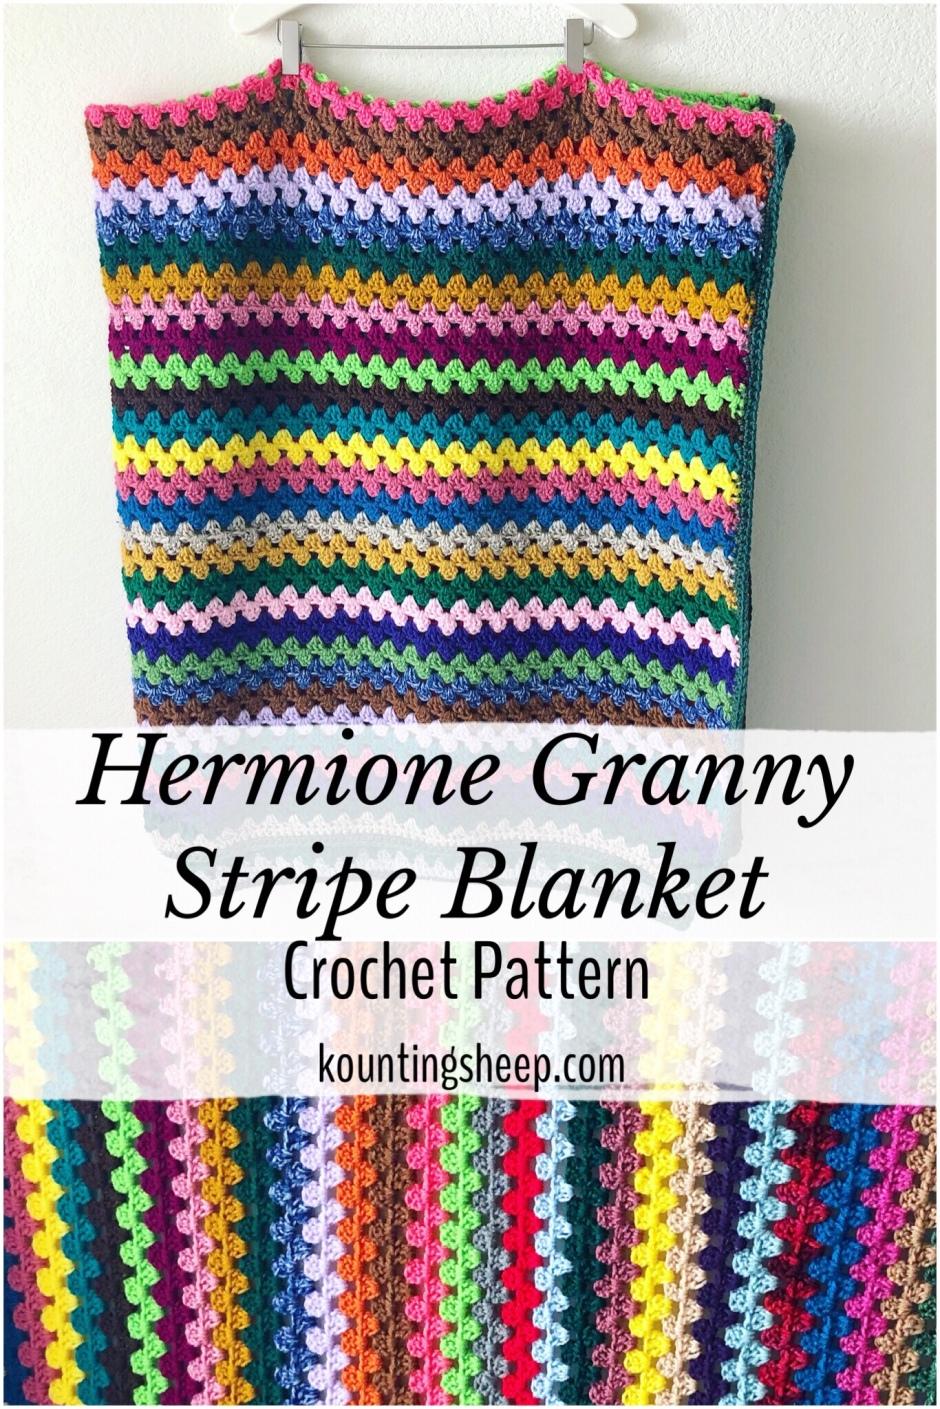 Hermione Granny Stripe Blanket Free Pattern Kountingsheep